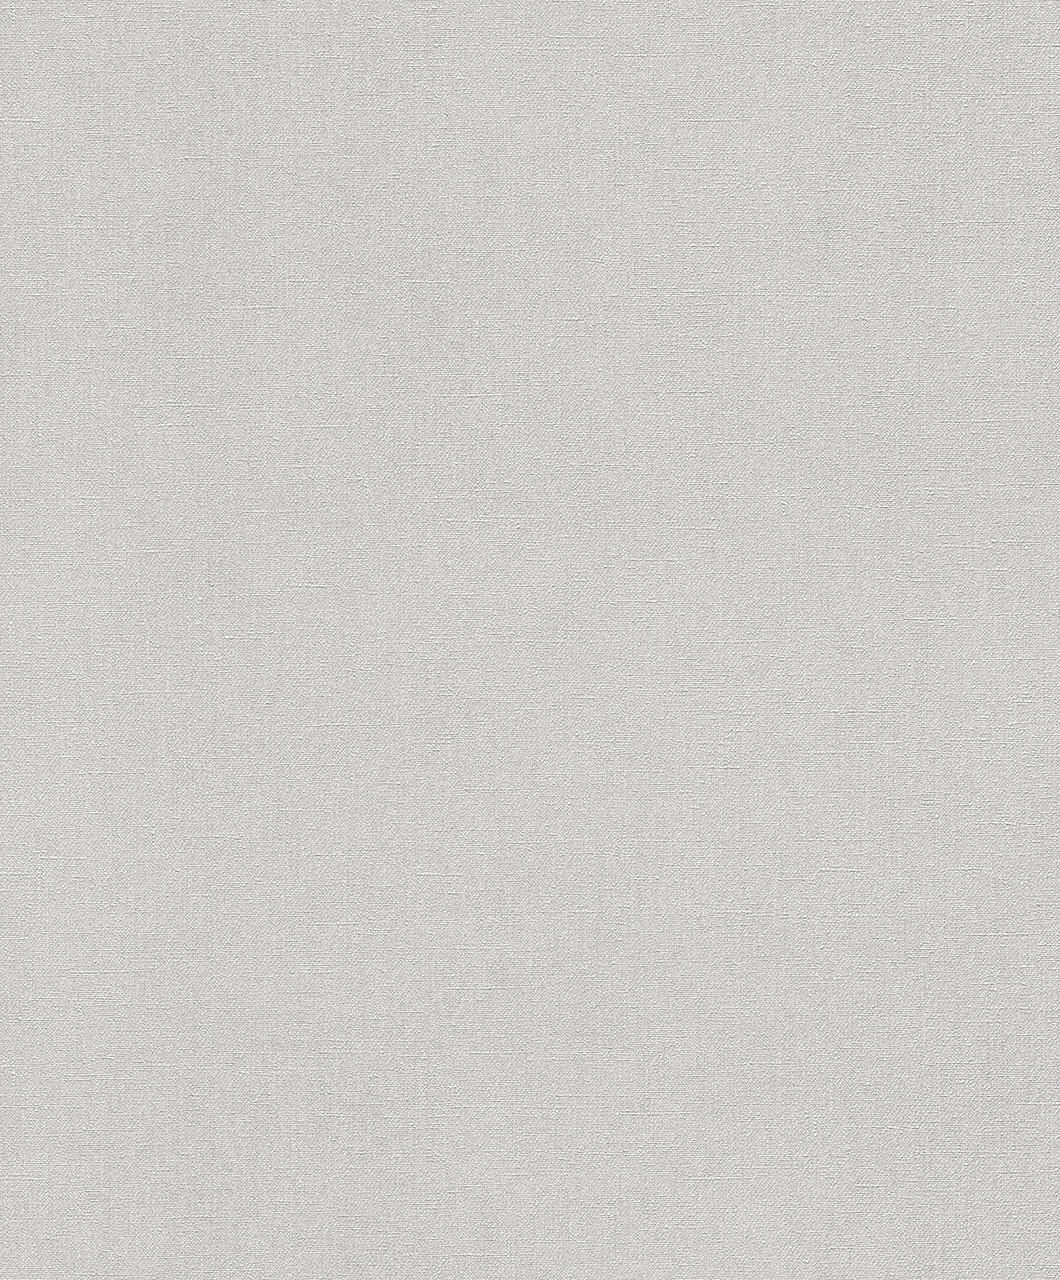 tapete barbara becker b b uni grau 479348. Black Bedroom Furniture Sets. Home Design Ideas